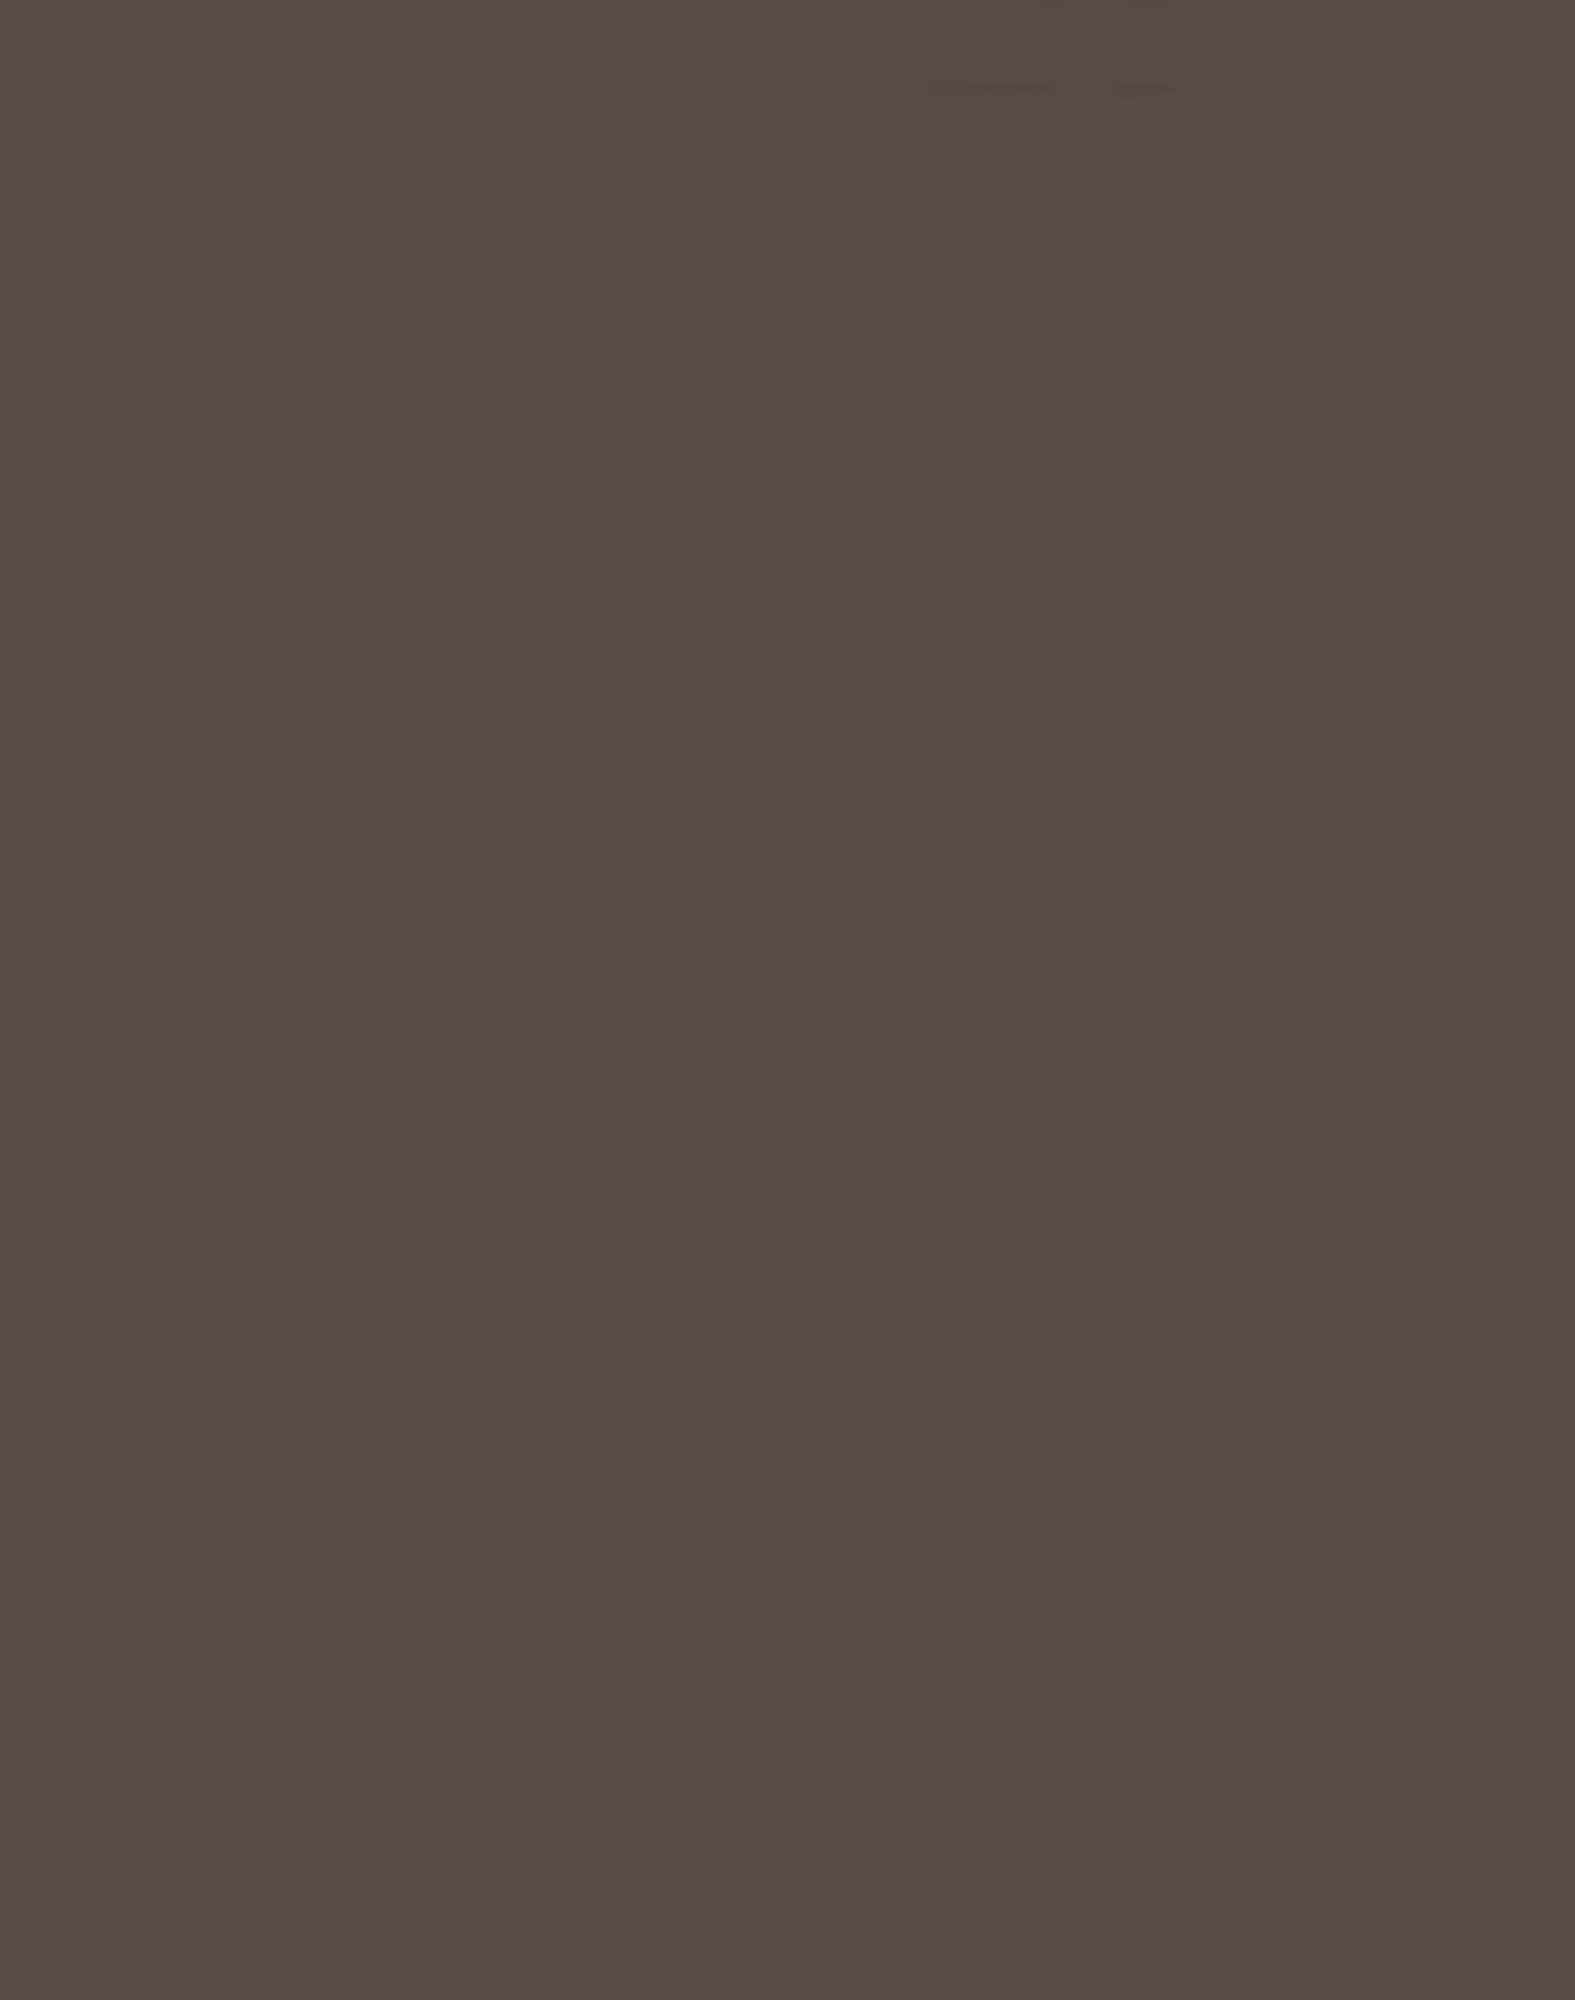 Chocolate 88,74,68